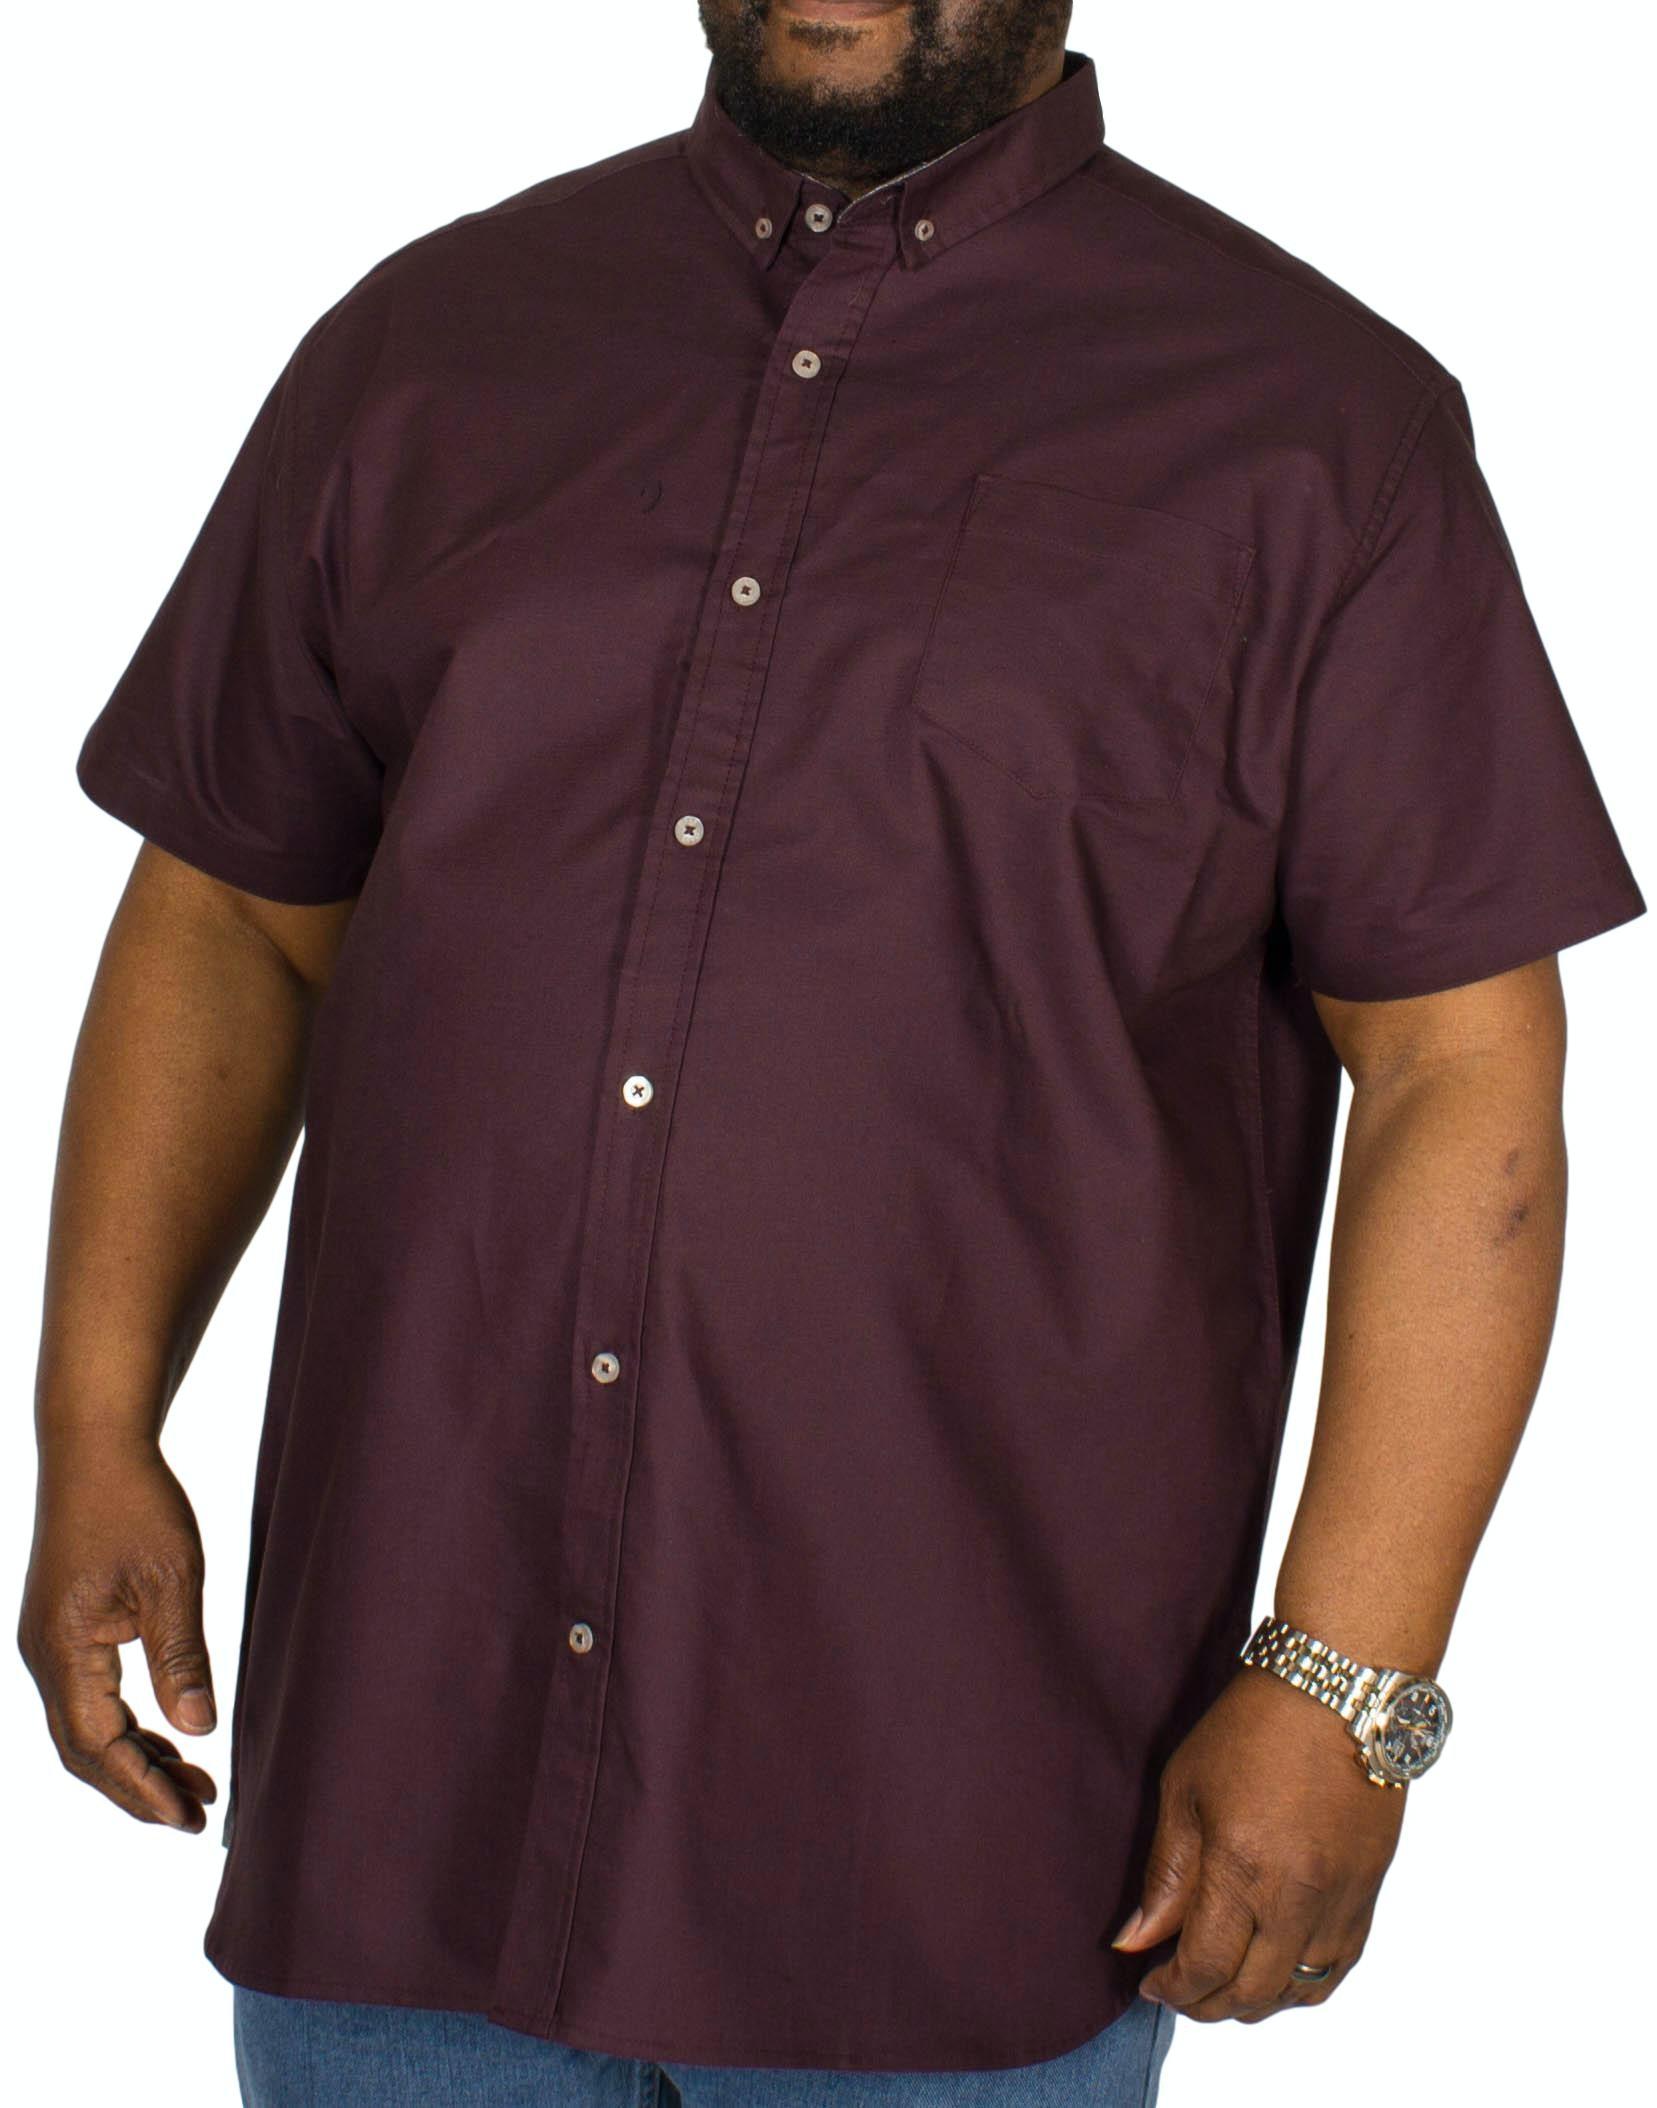 D555 Kevin Short Sleeve Oxford Shirt Plum